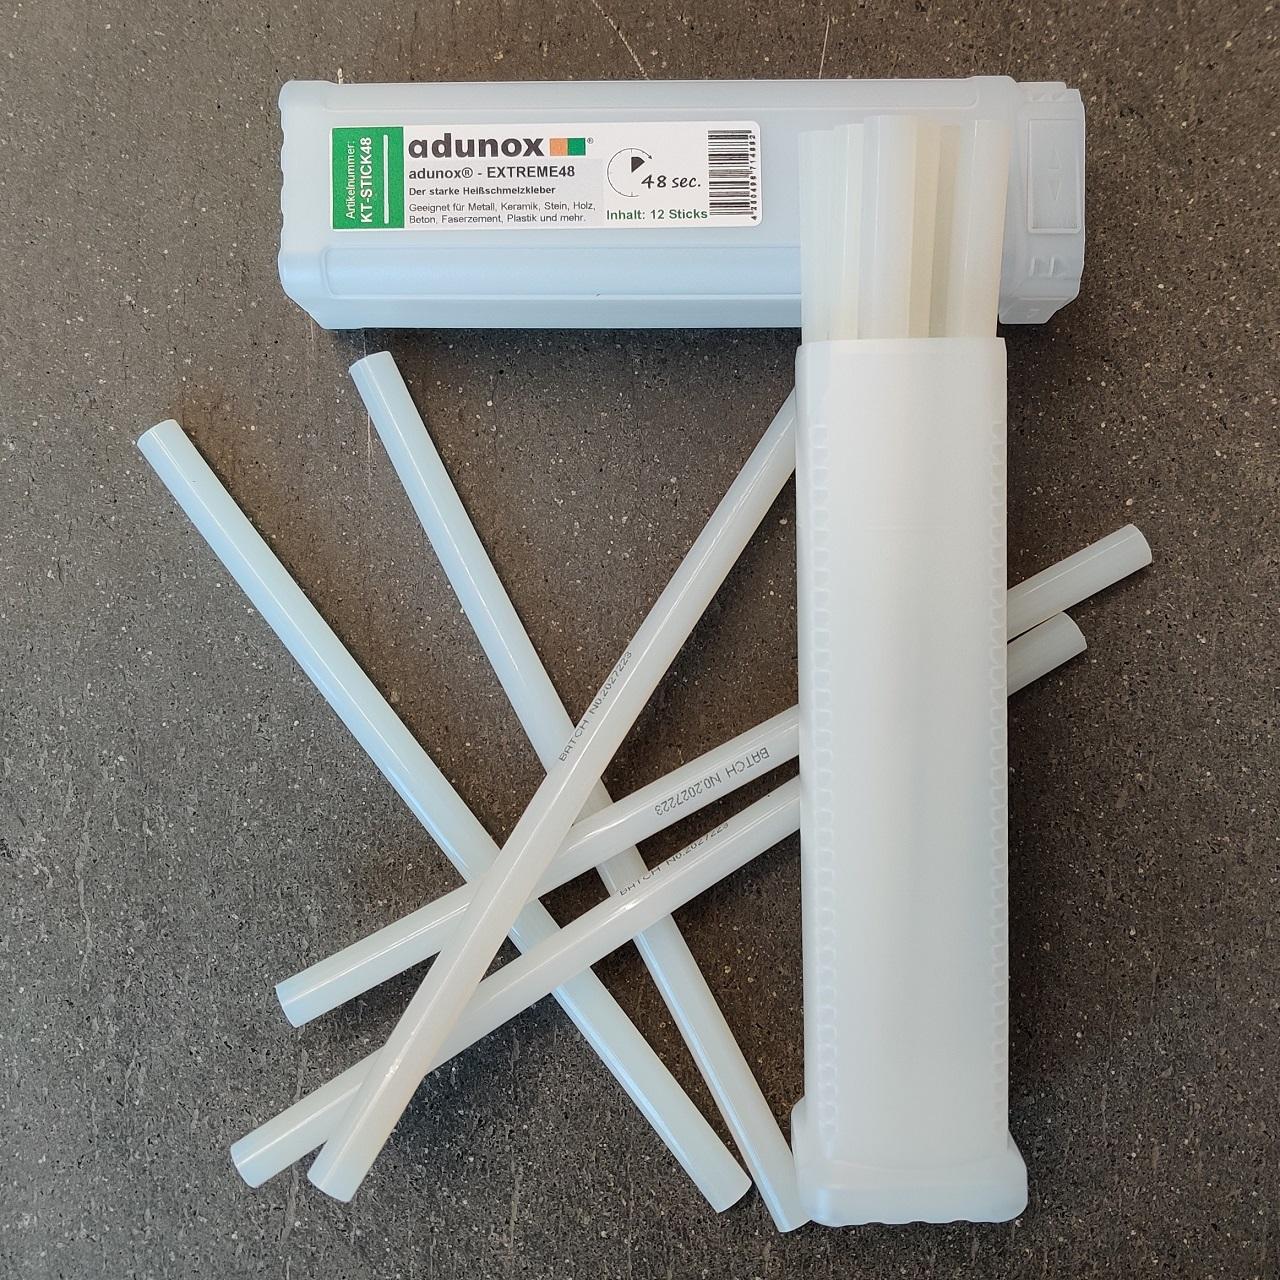 Heißschmelzkleber adunox®-EXTREME48 | 12 Sticks